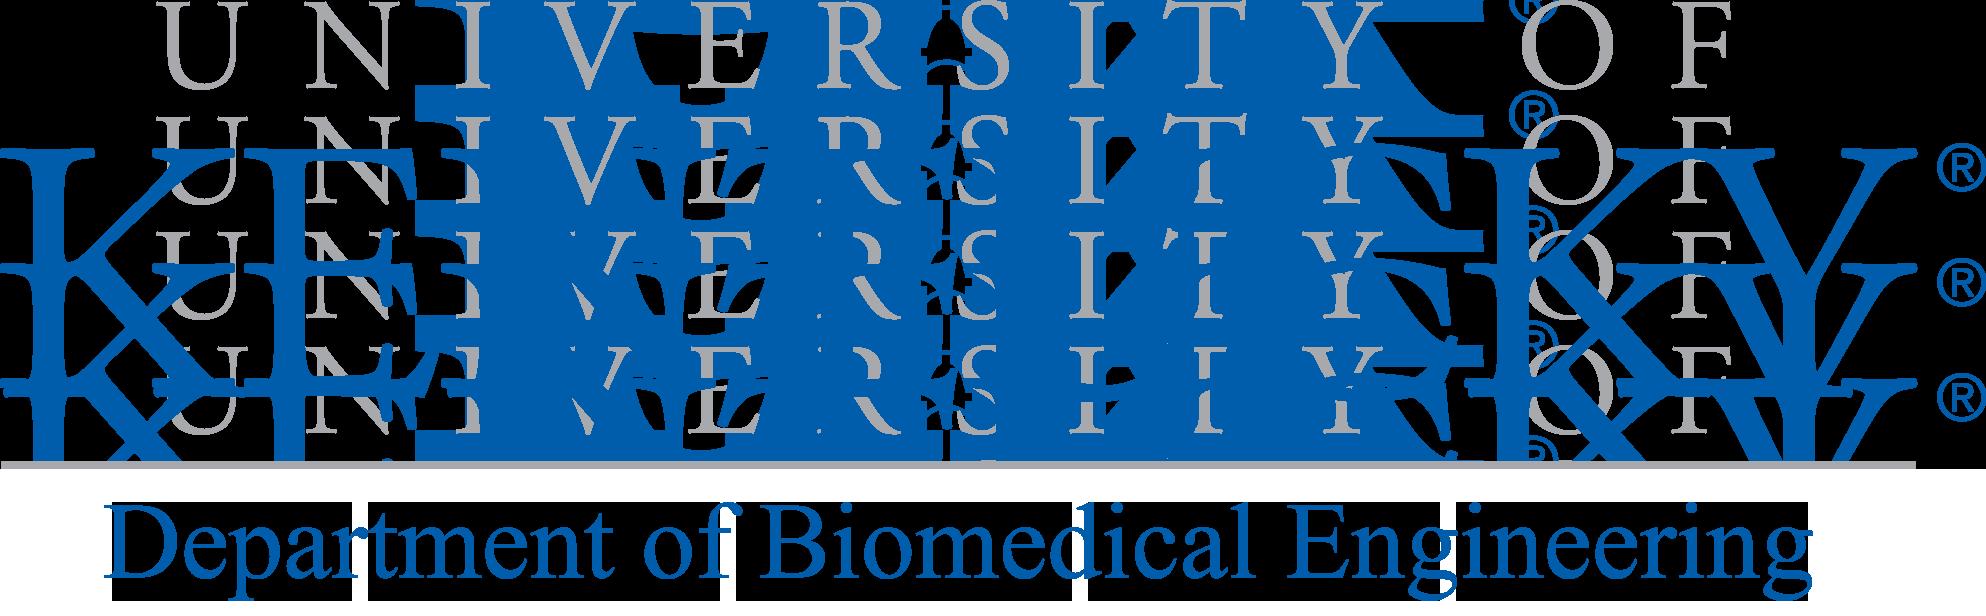 Paladin Medical University of Kentucky Department of Biomedical Engineering